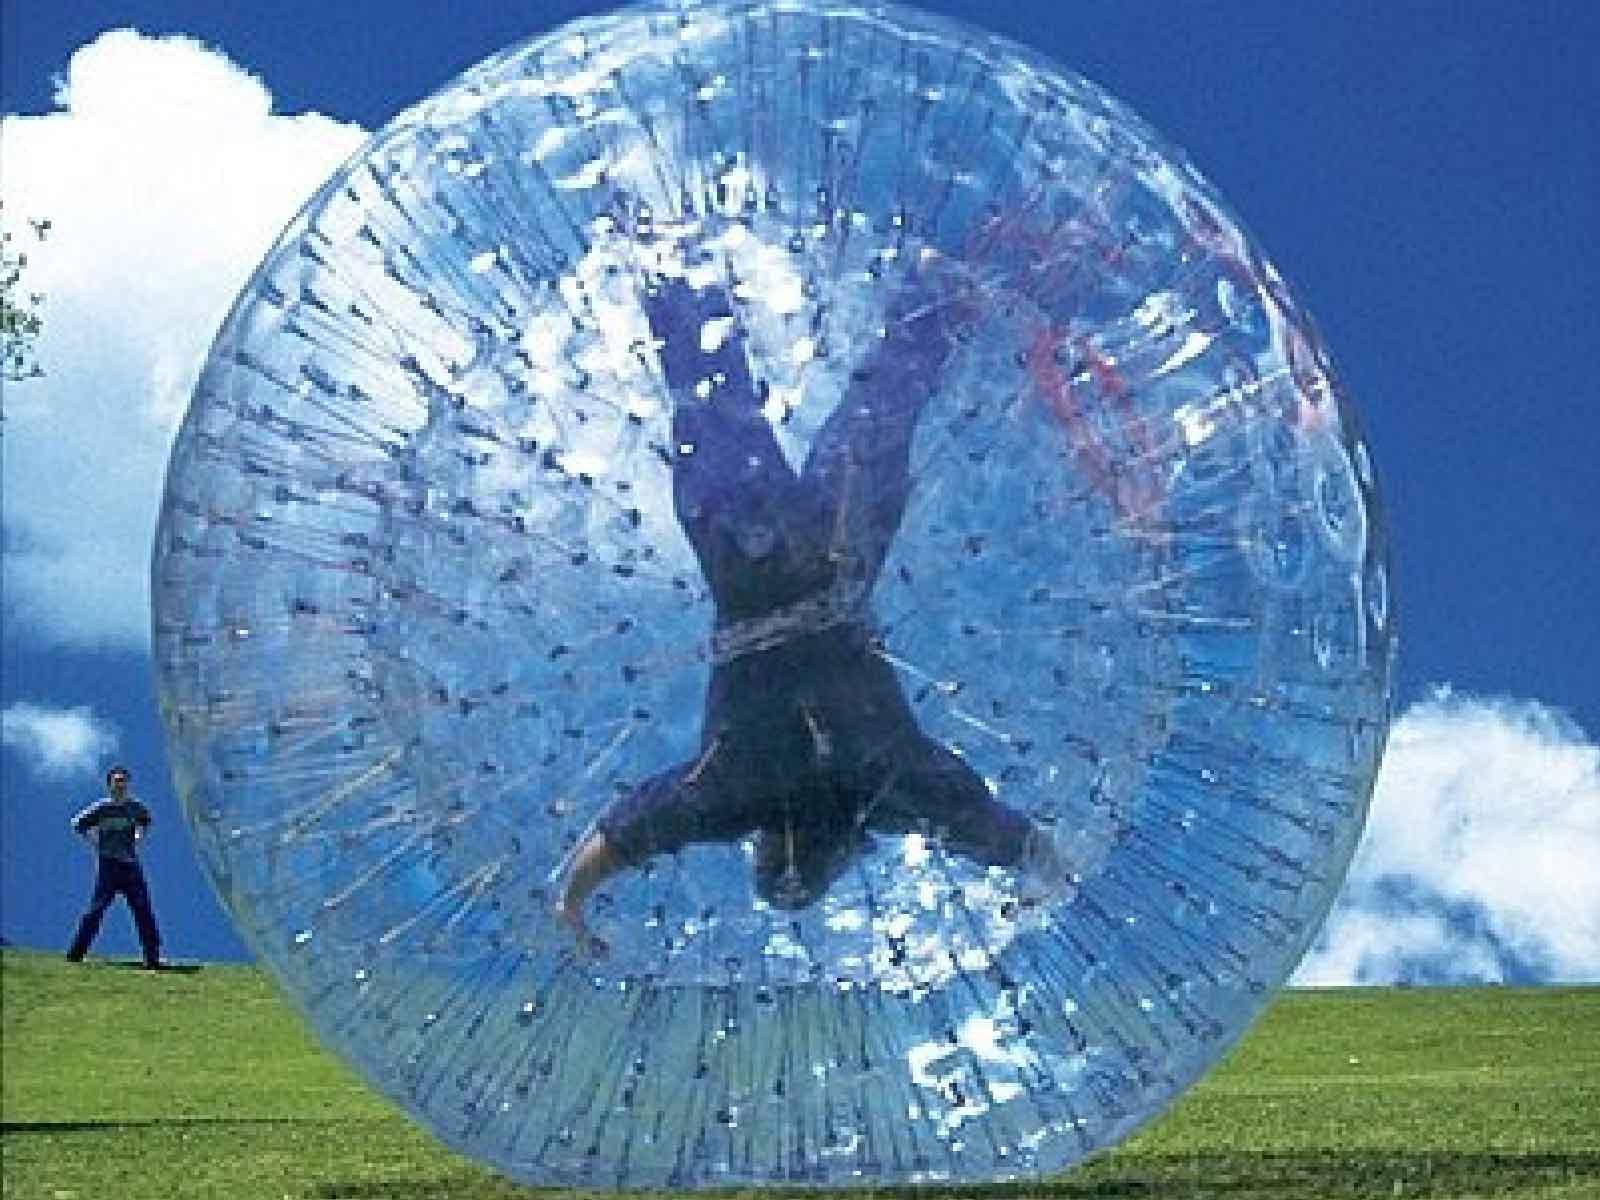 jeux gonflable zorb balls